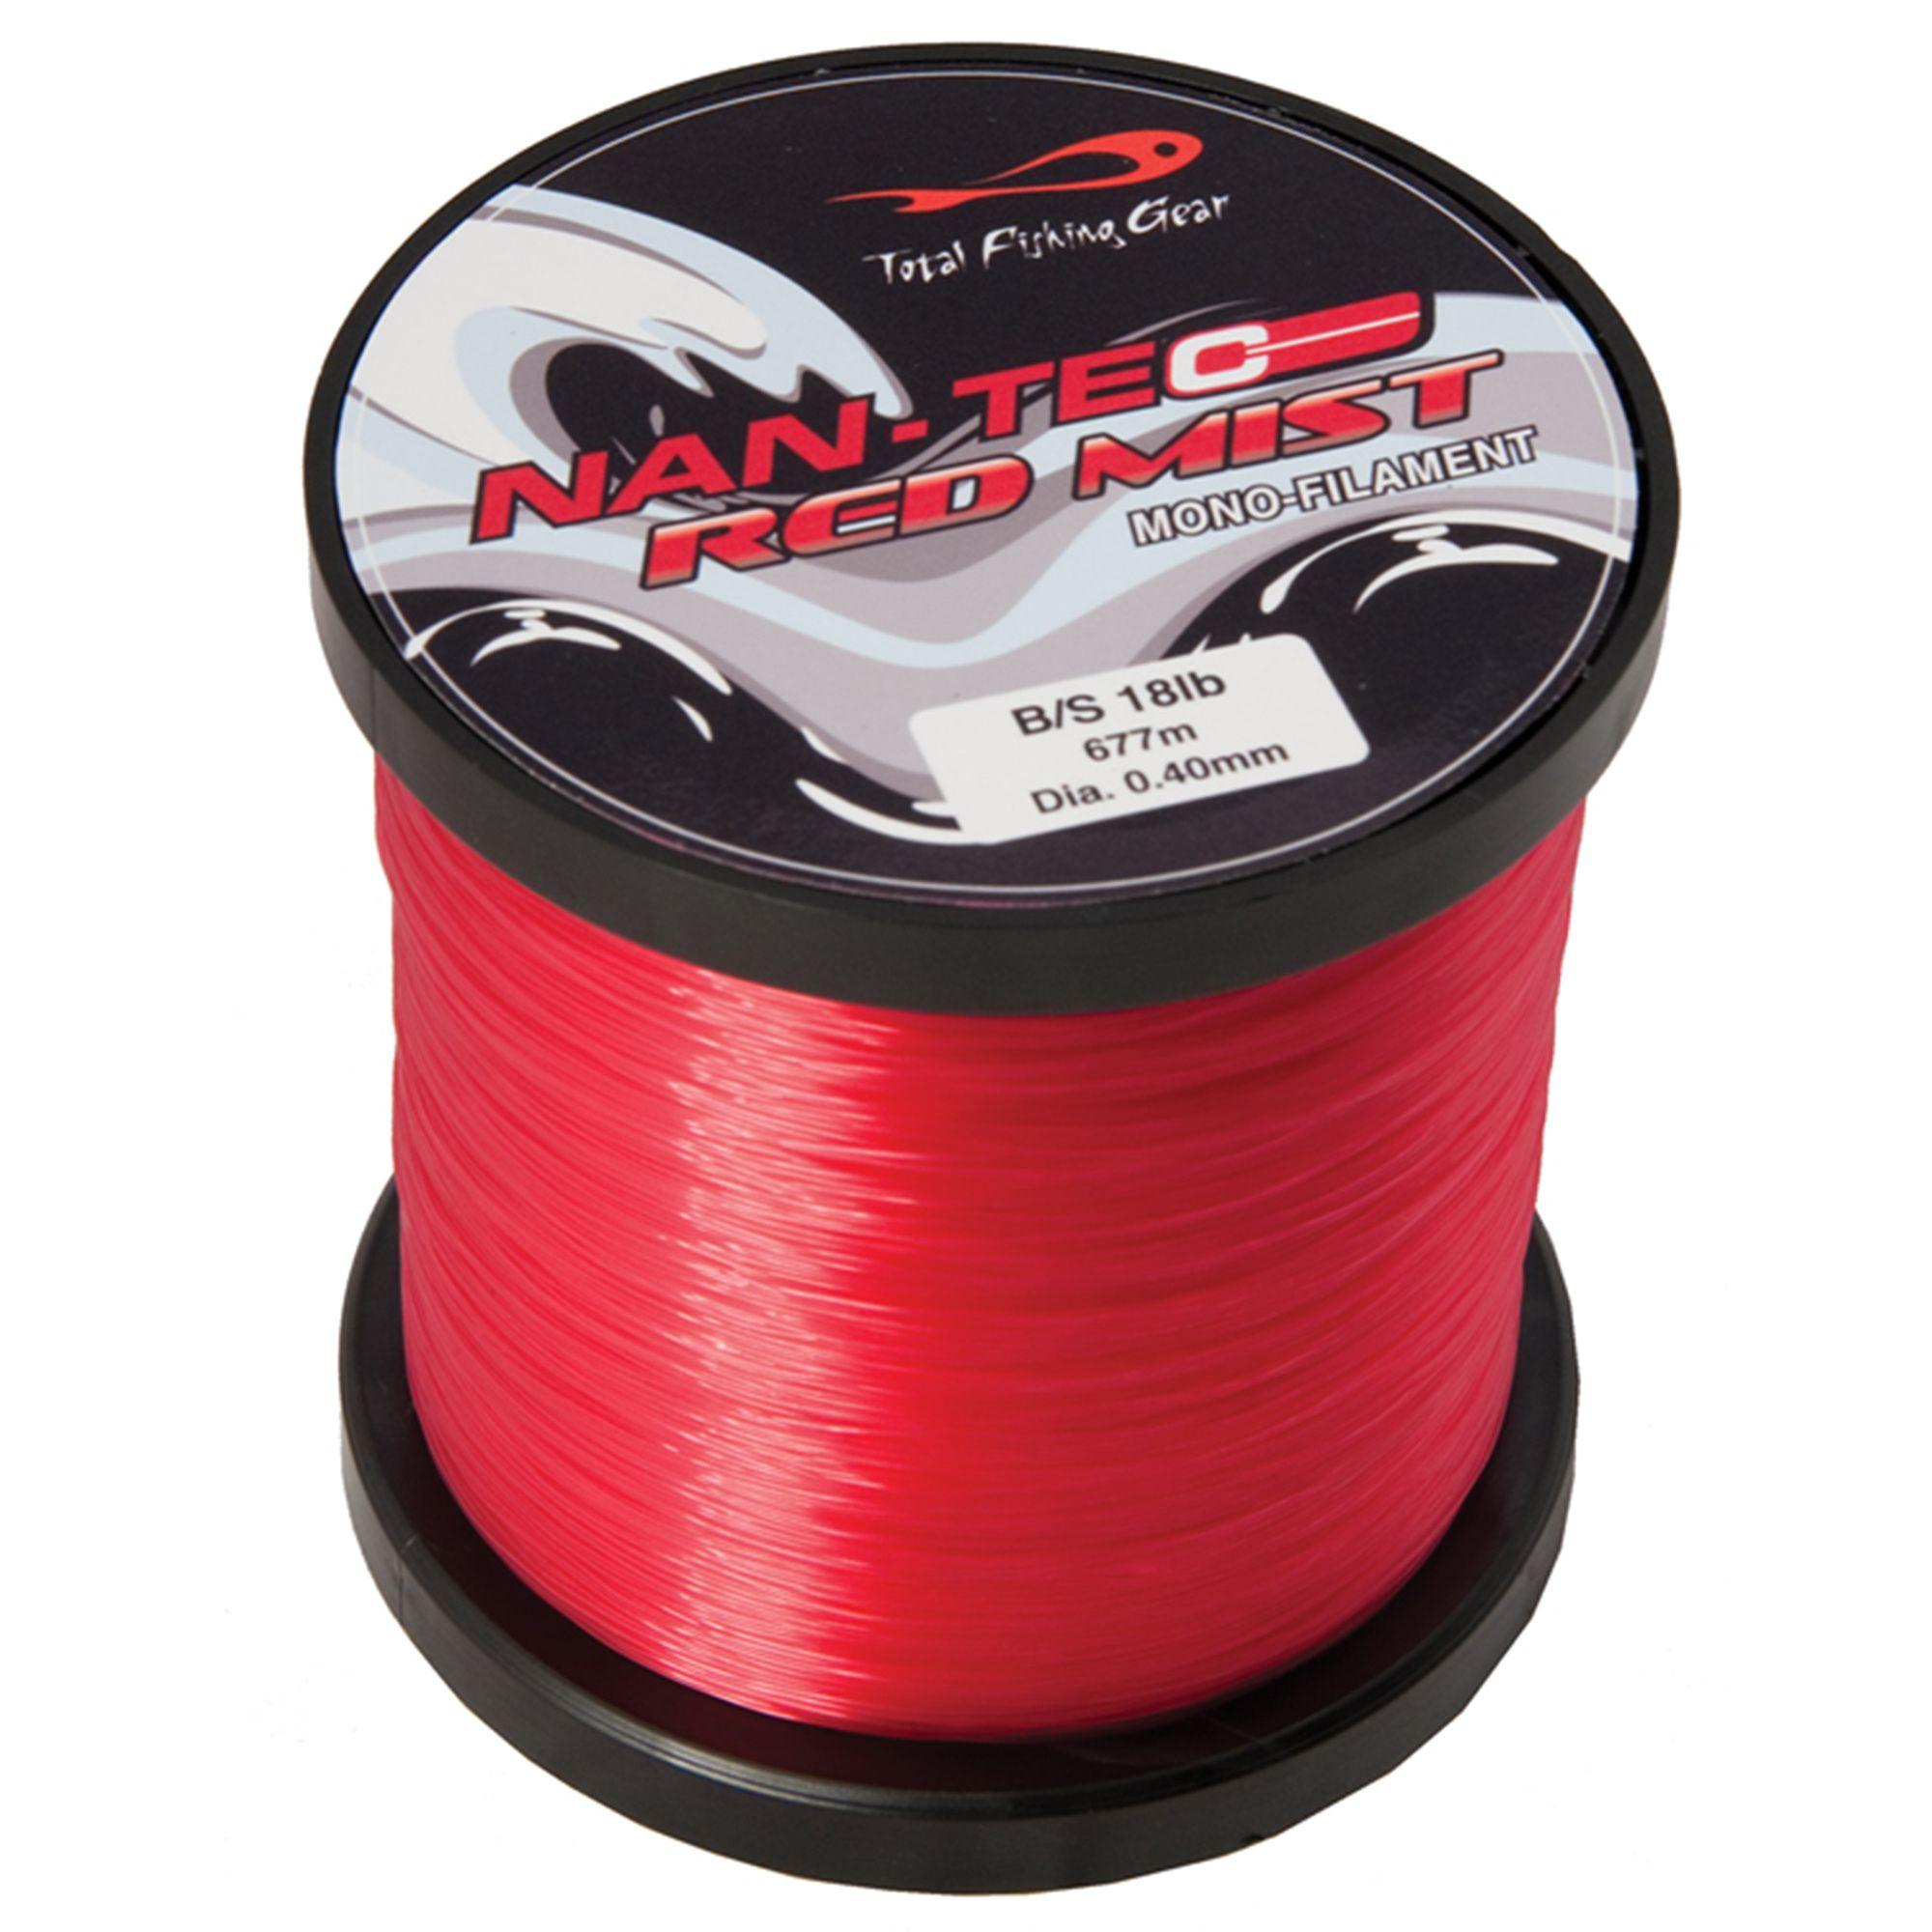 TFG Nan-Tec Red Mist Mono Filament Line 12lb